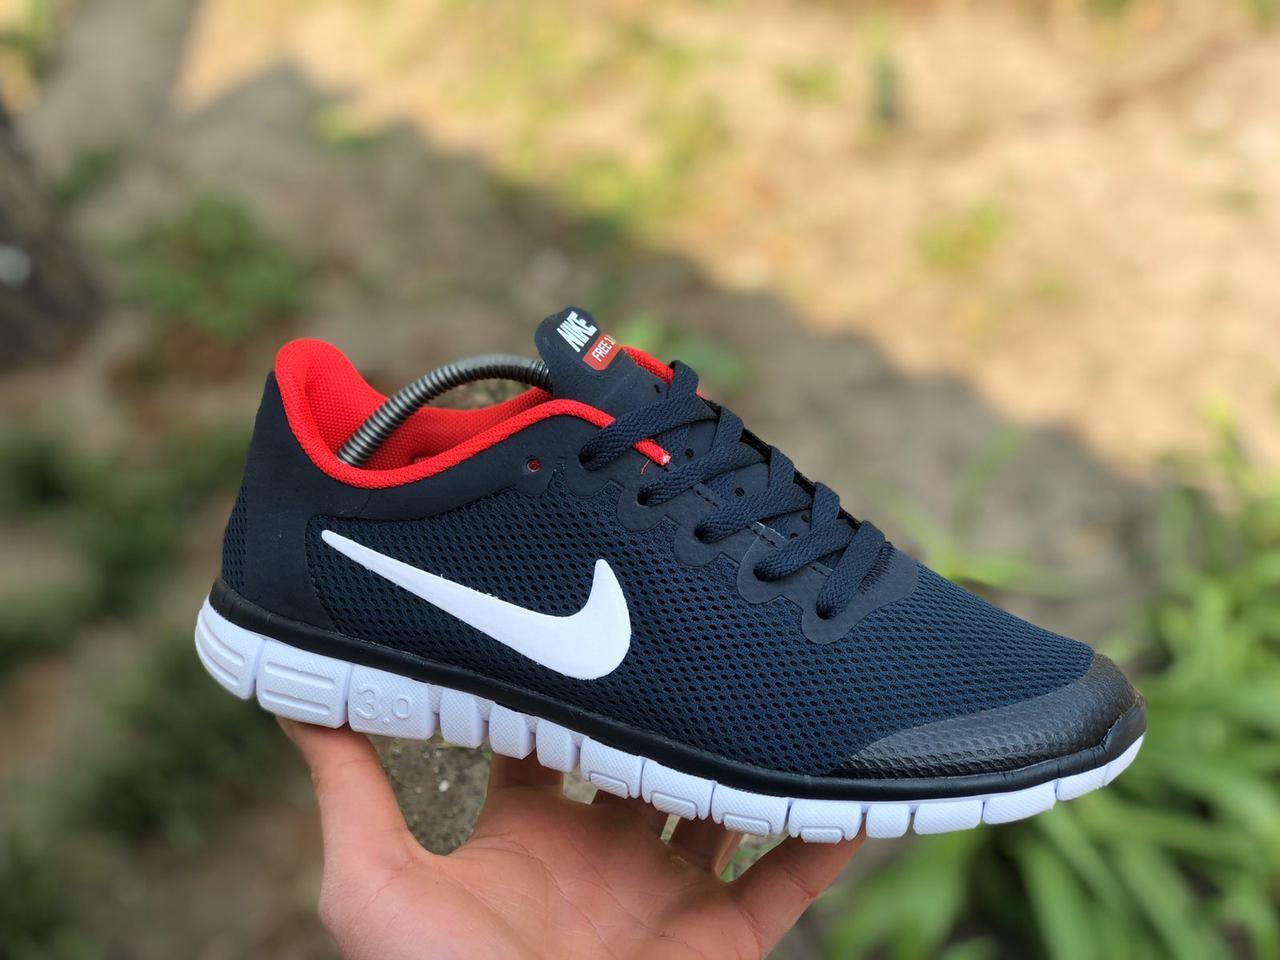 Мужские кроссовки в стиле Nike Free Run 3.0 для бега синие с красным